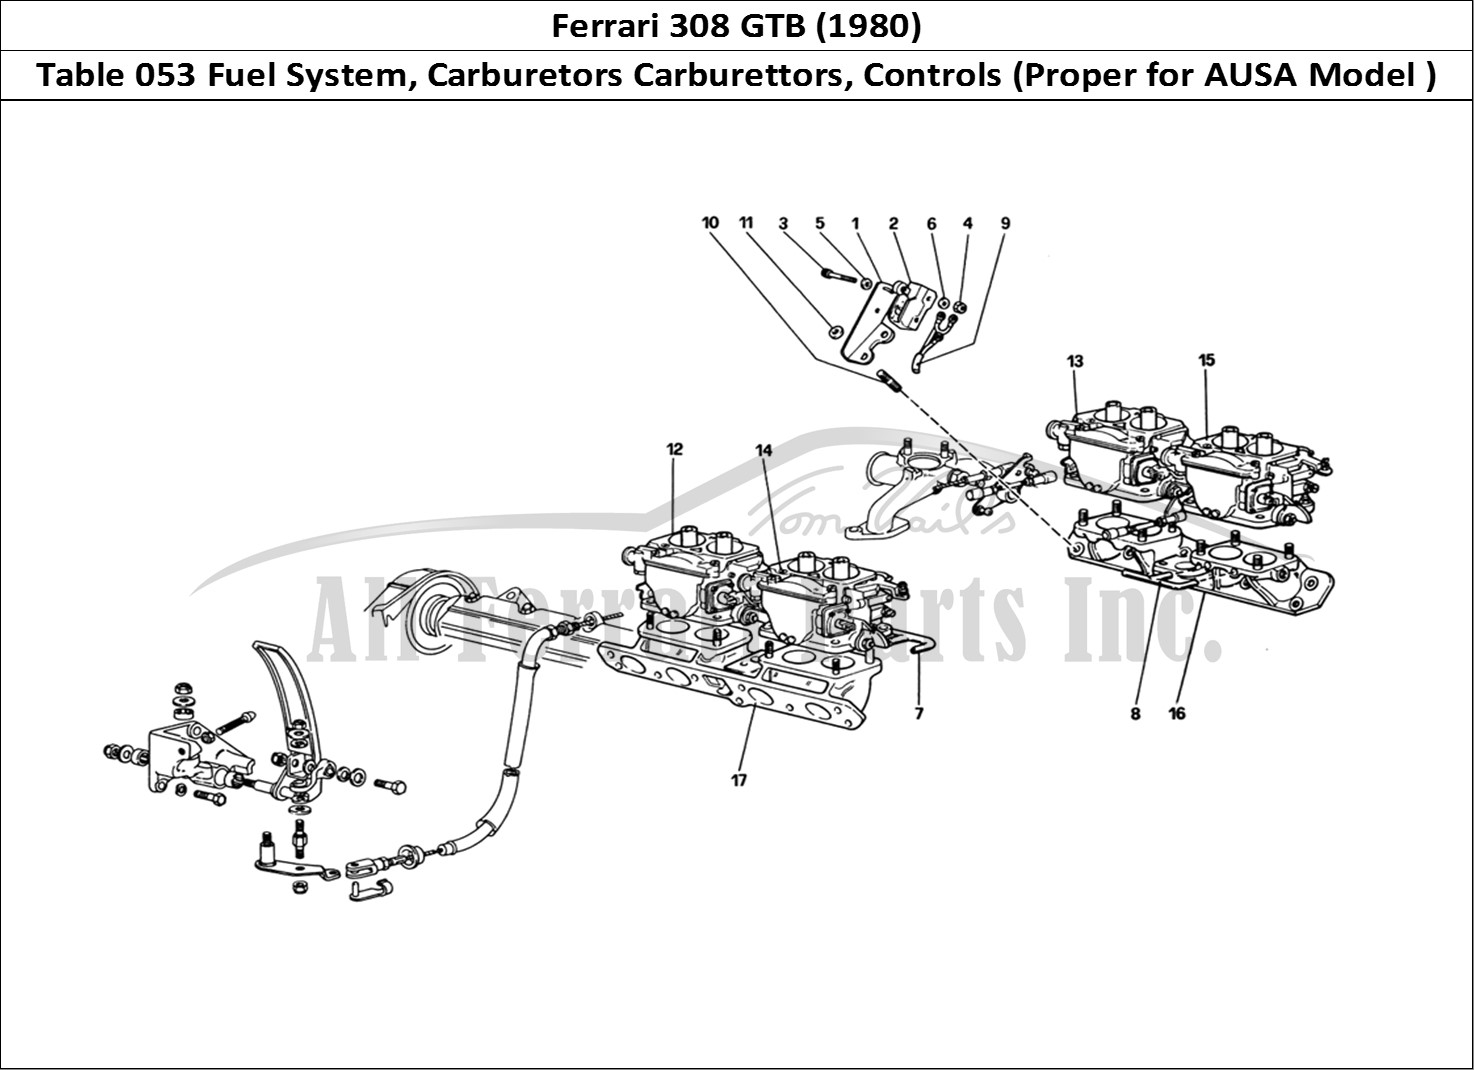 Buy Original Ferrari 308 Gtb 053 Fuel System